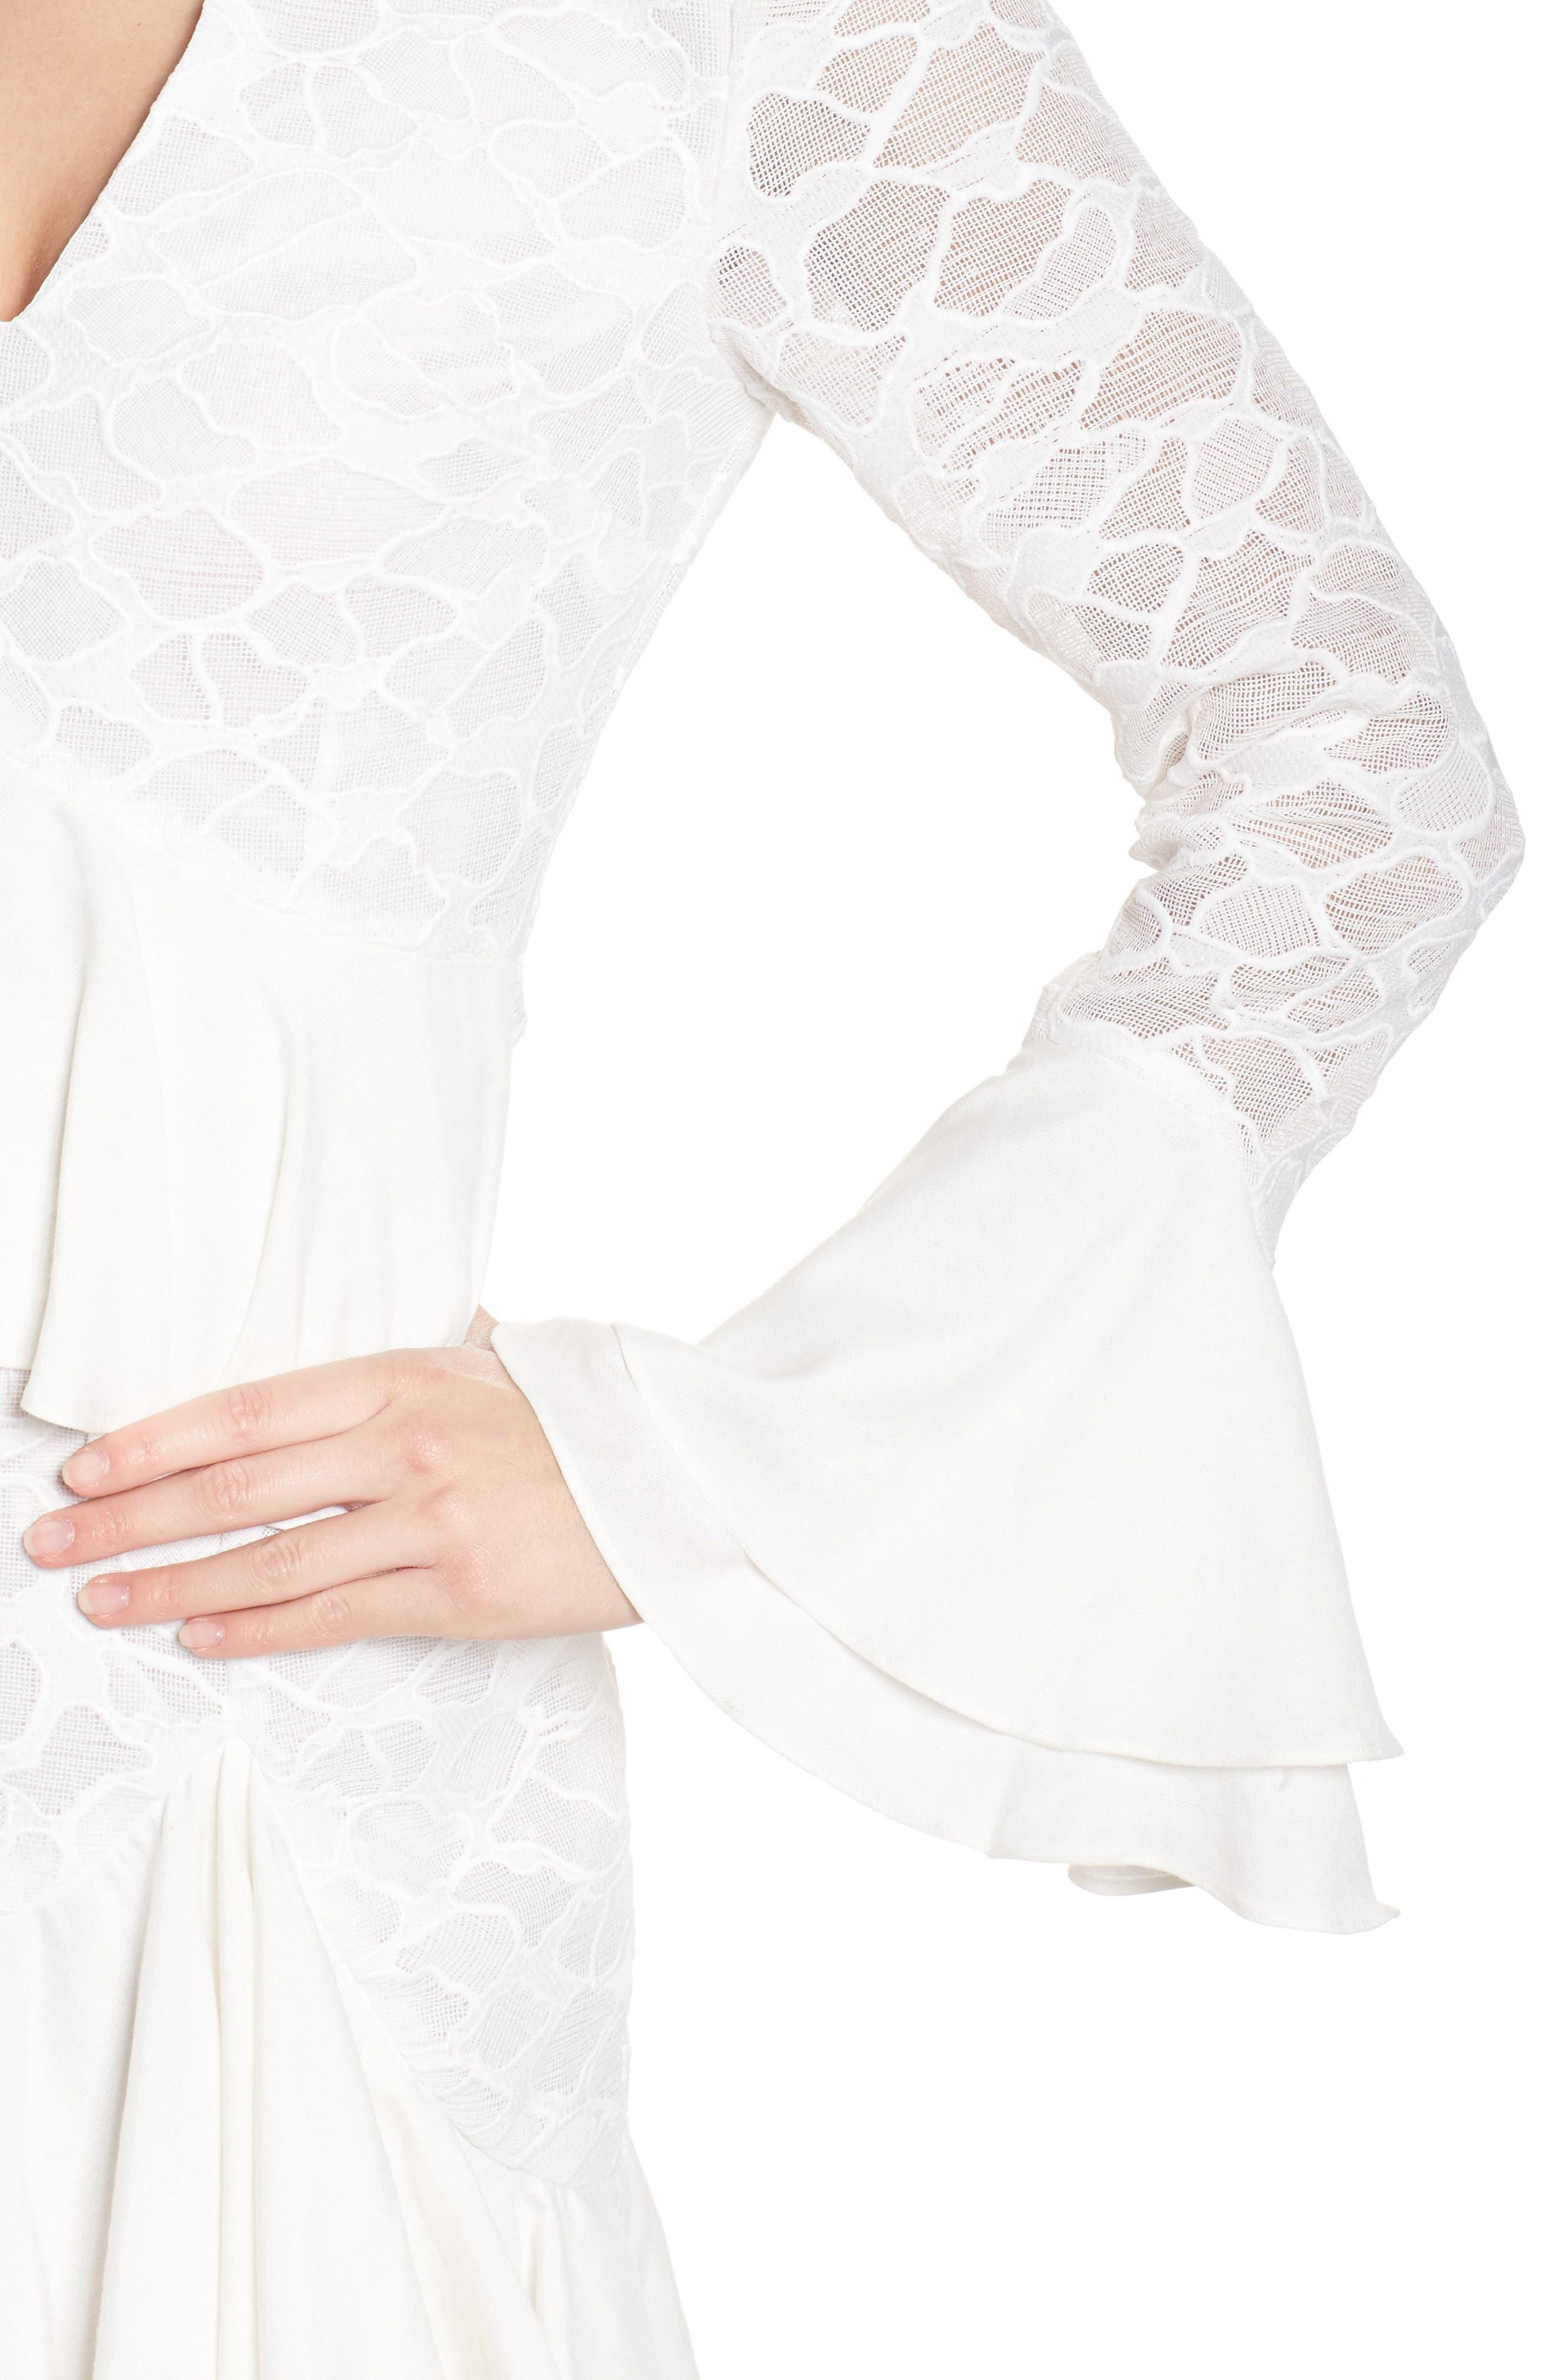 Phase Ruffle Lace Minidress,                             Alternate thumbnail 4, color,                             902